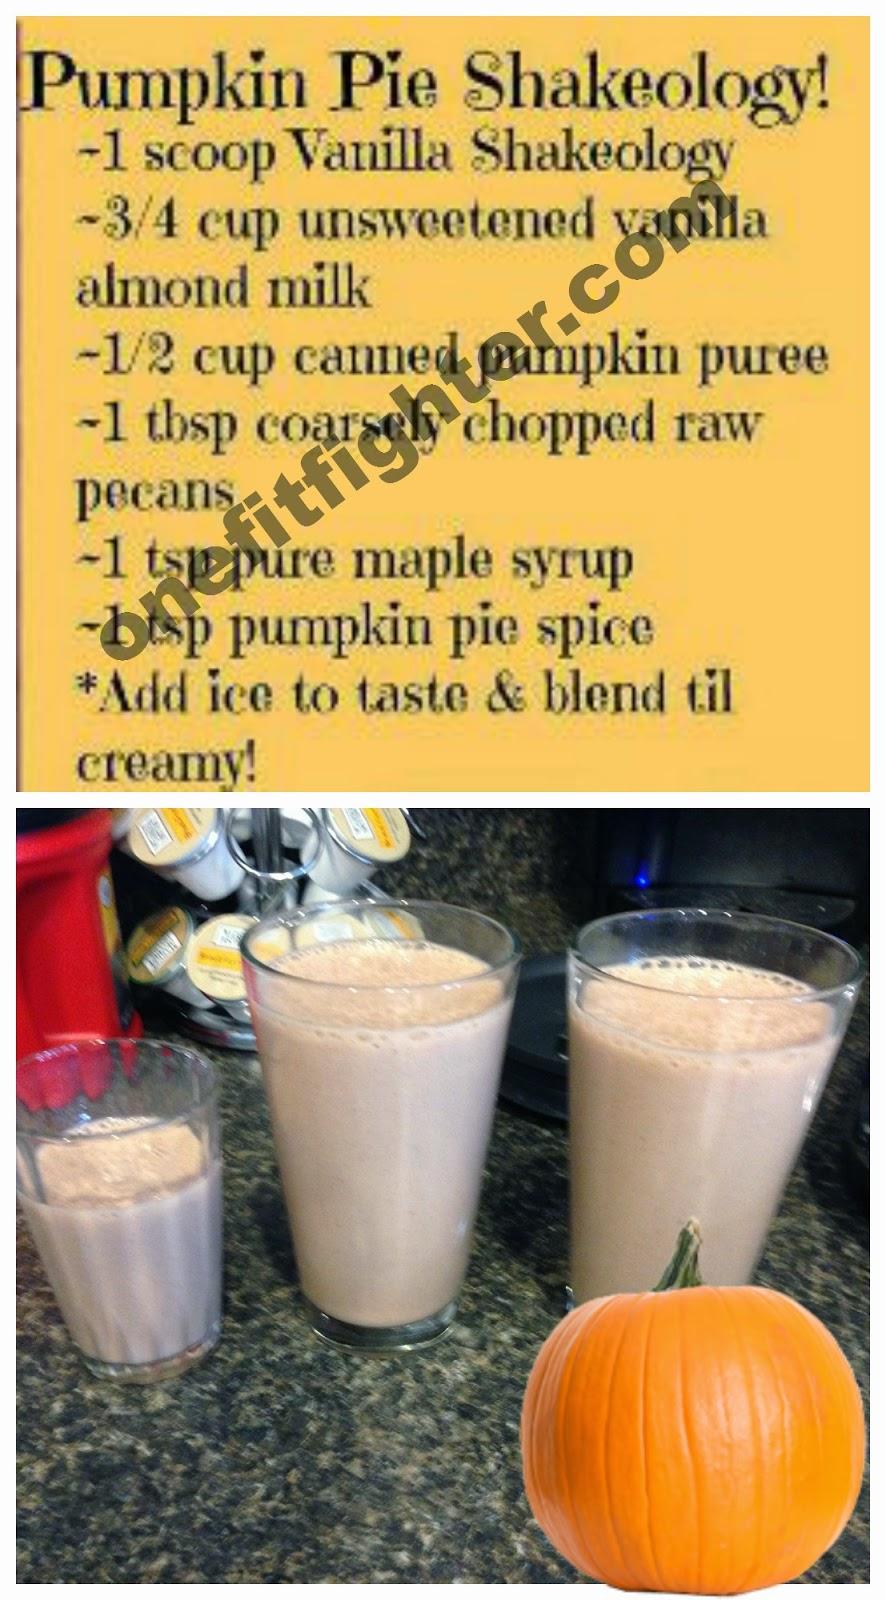 pumpkin pie shakeology, shakeology pumpkine recipe